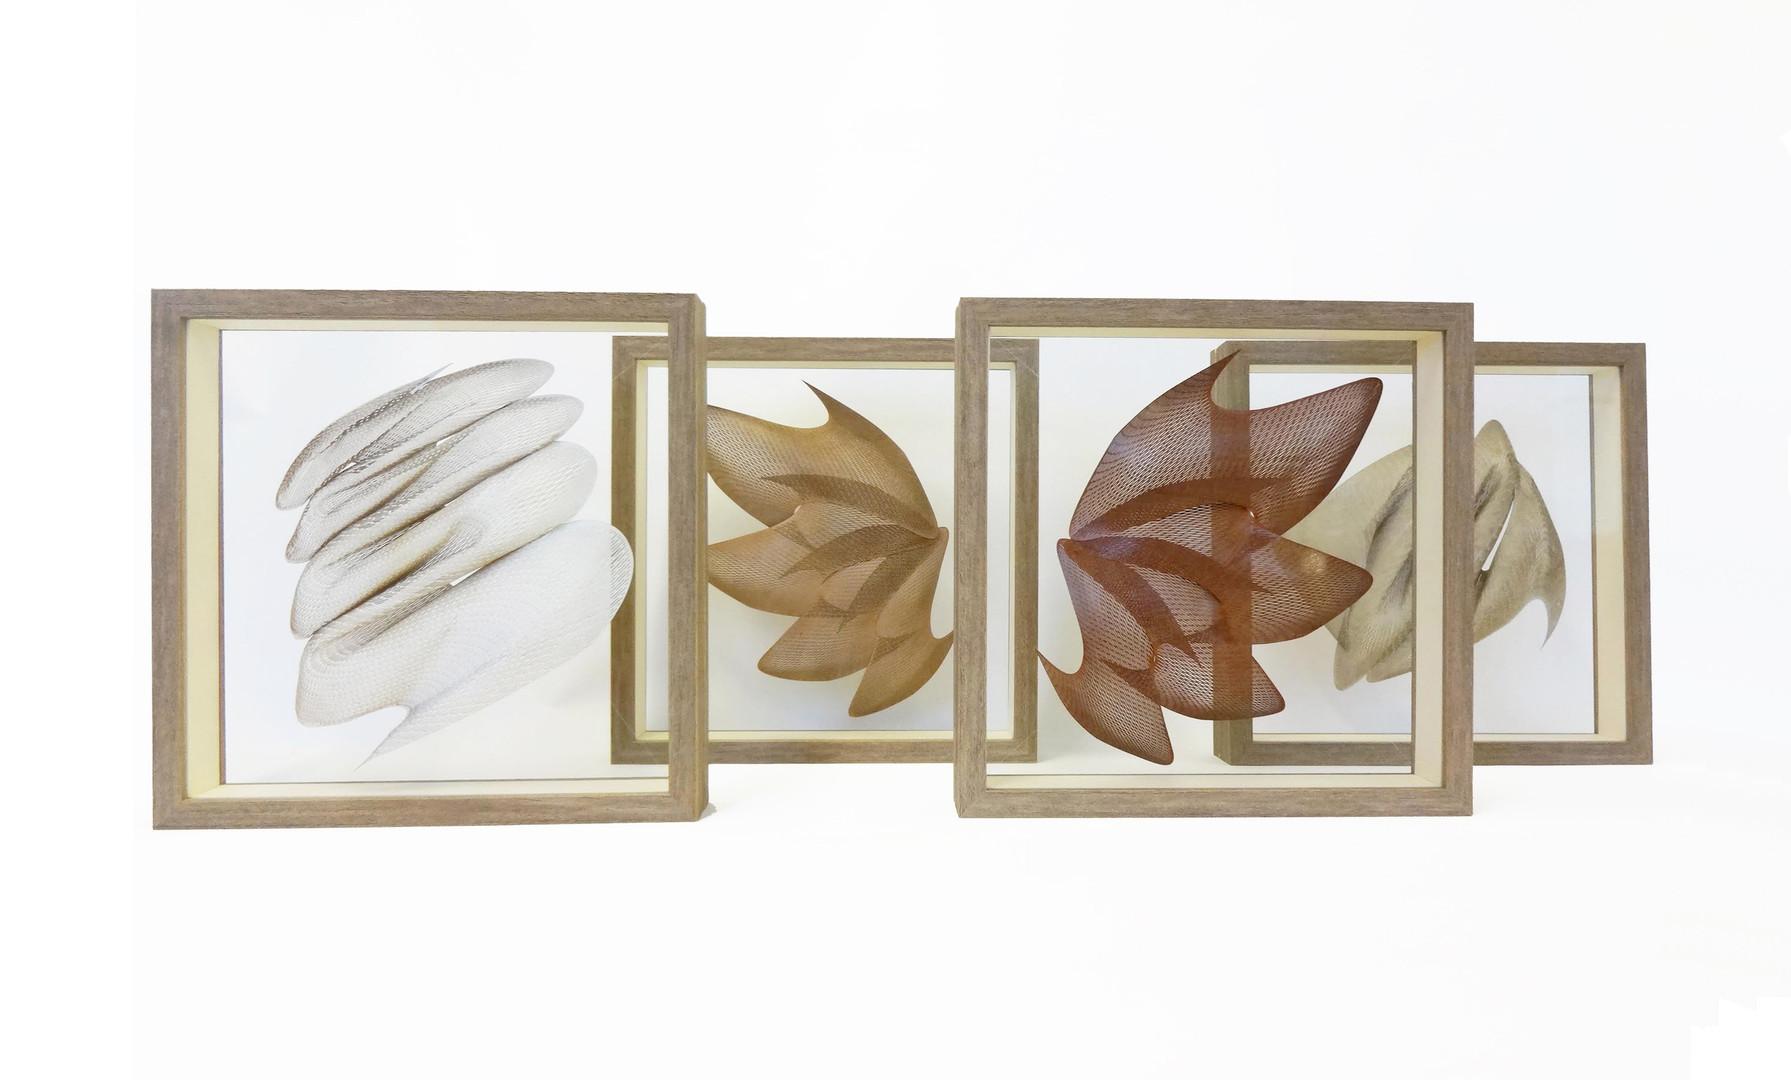 Double-sided glass frame  w)35cm x h)35cm x d)5.5cm /each